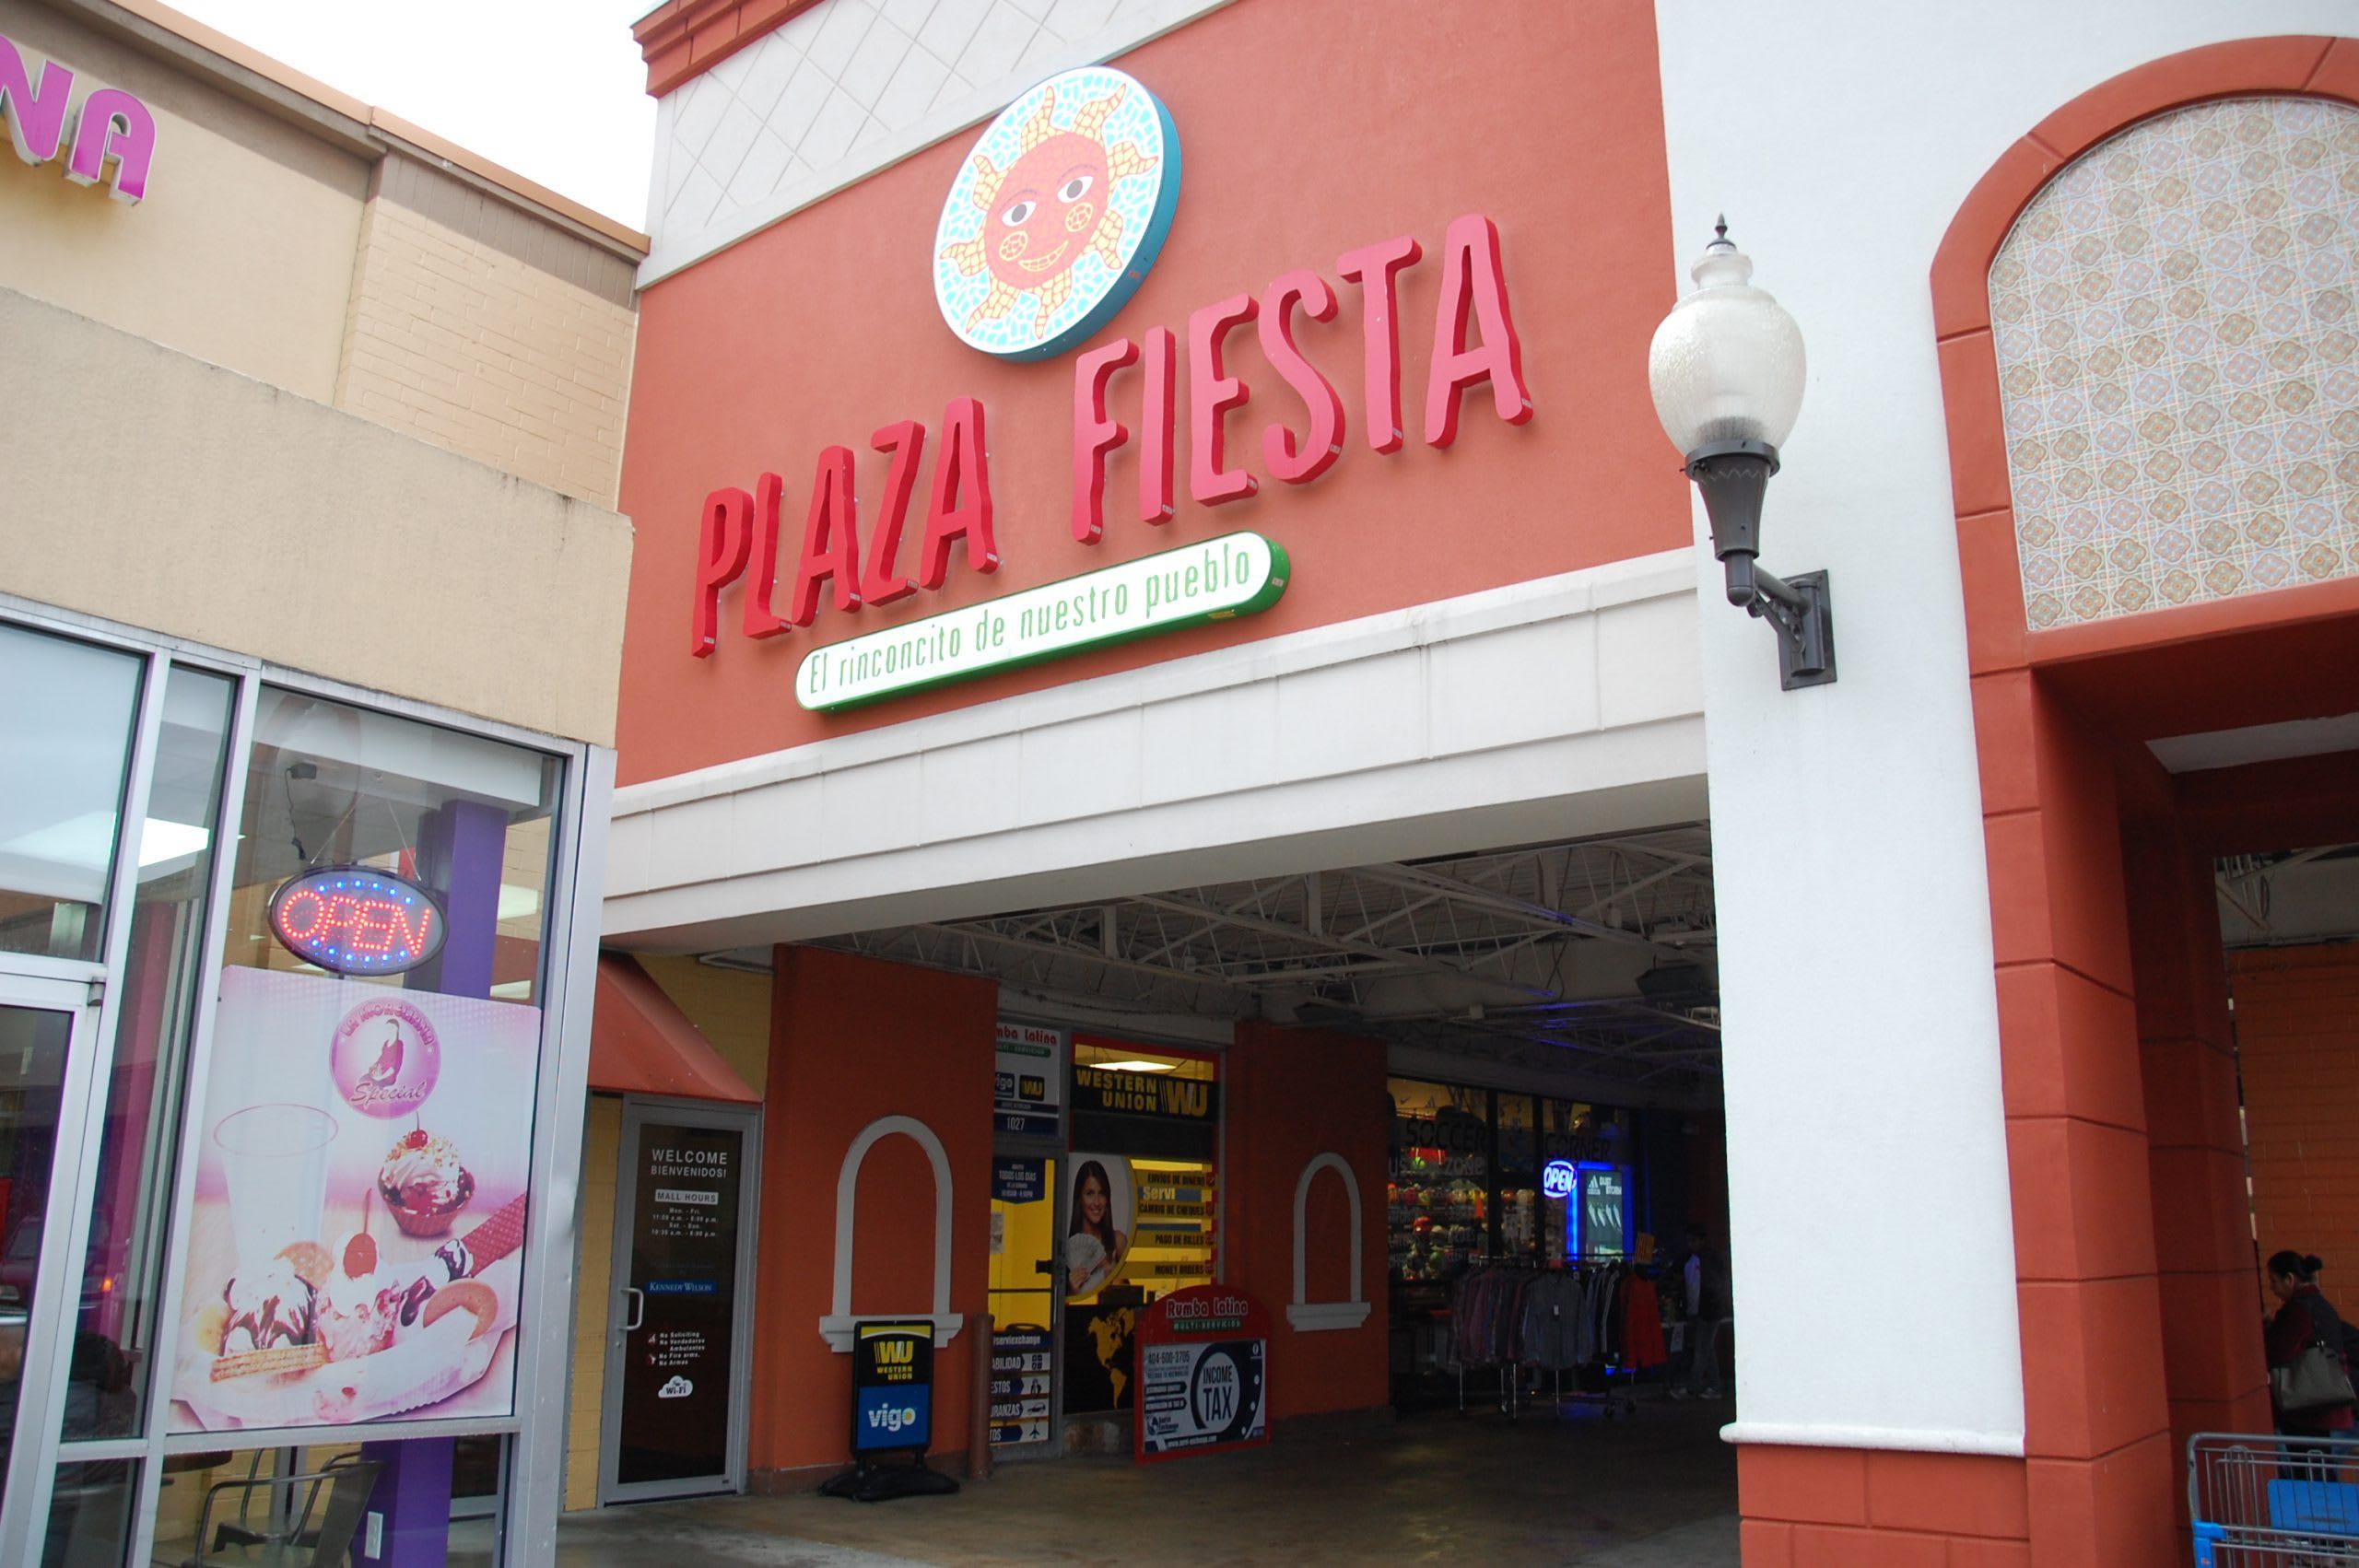 Plaza Fiesta